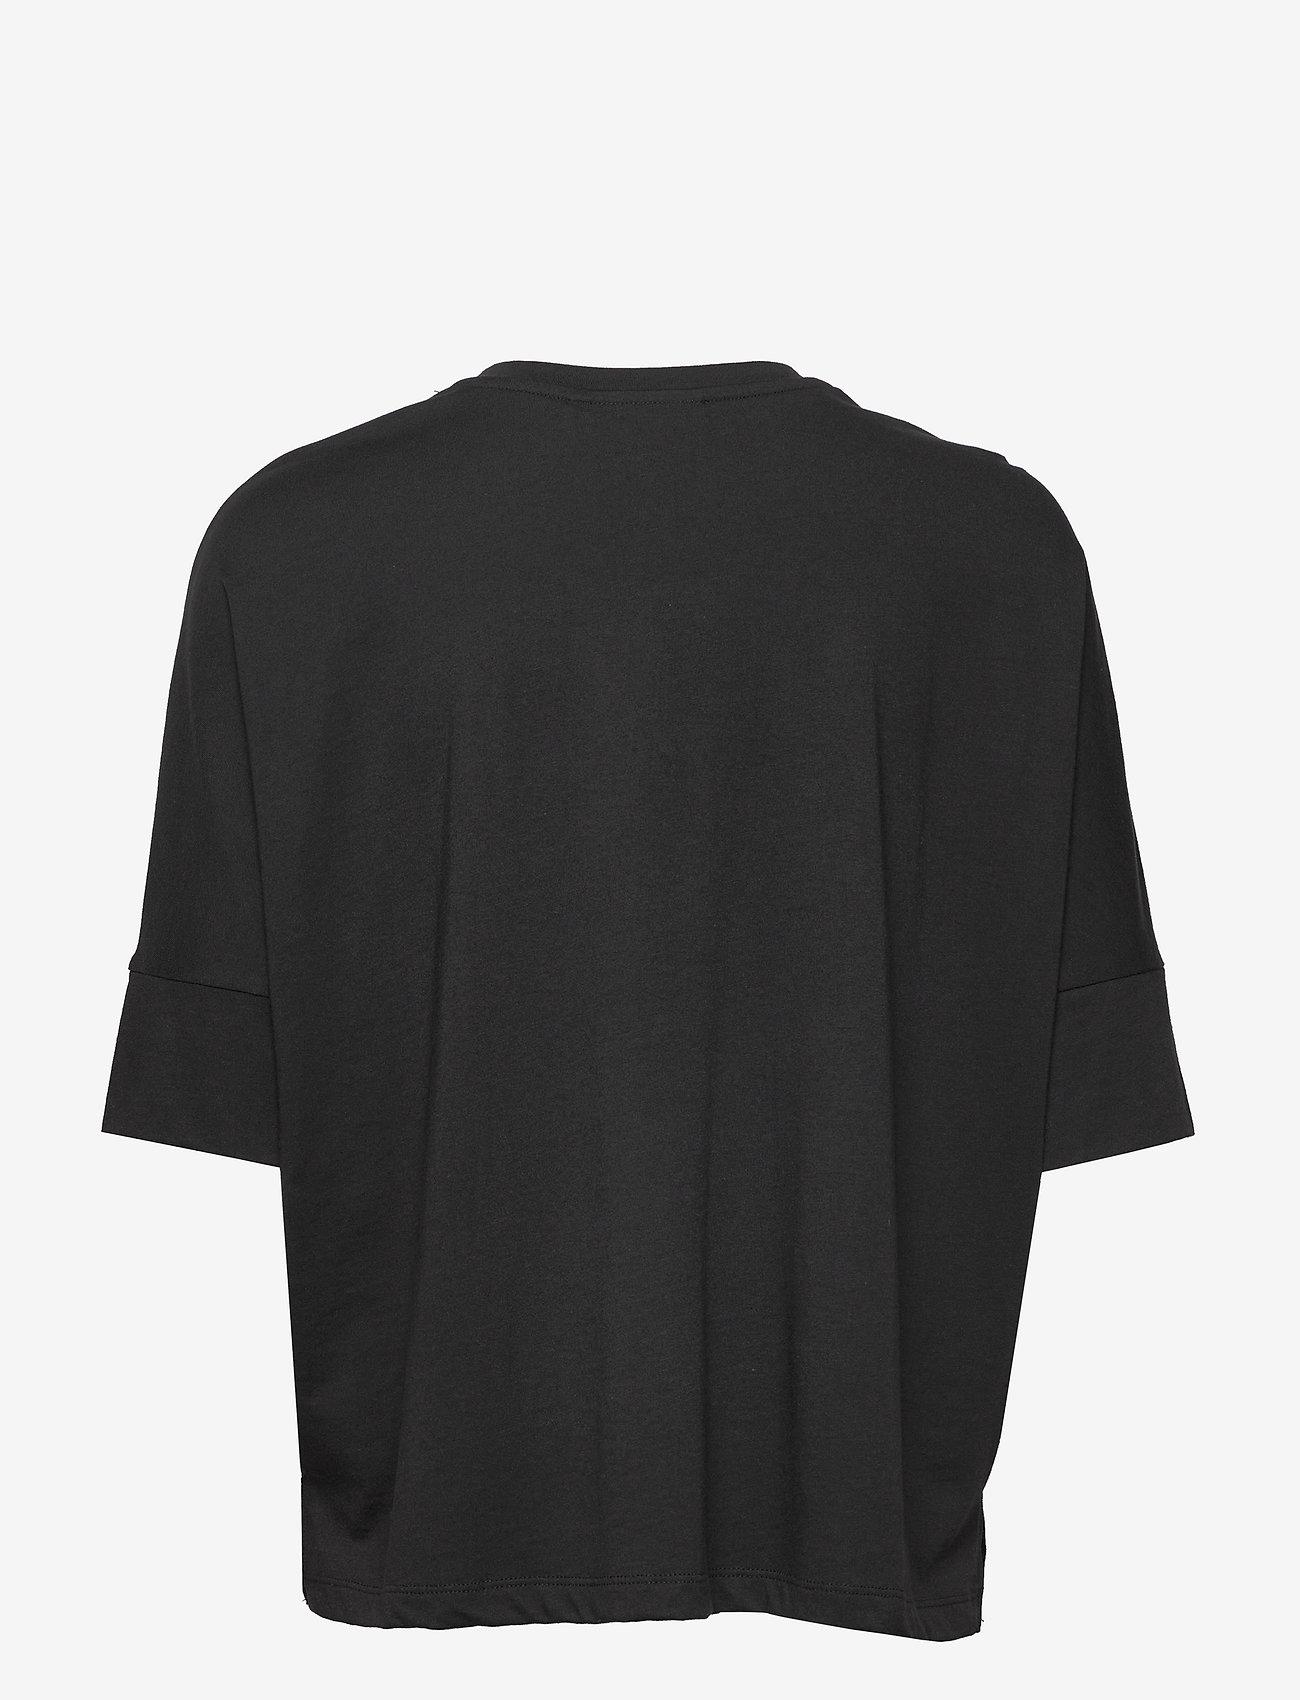 InWear HuldaIW T-shirt - T-shirts & topper BLACK - Dameklær Spesialtilbud